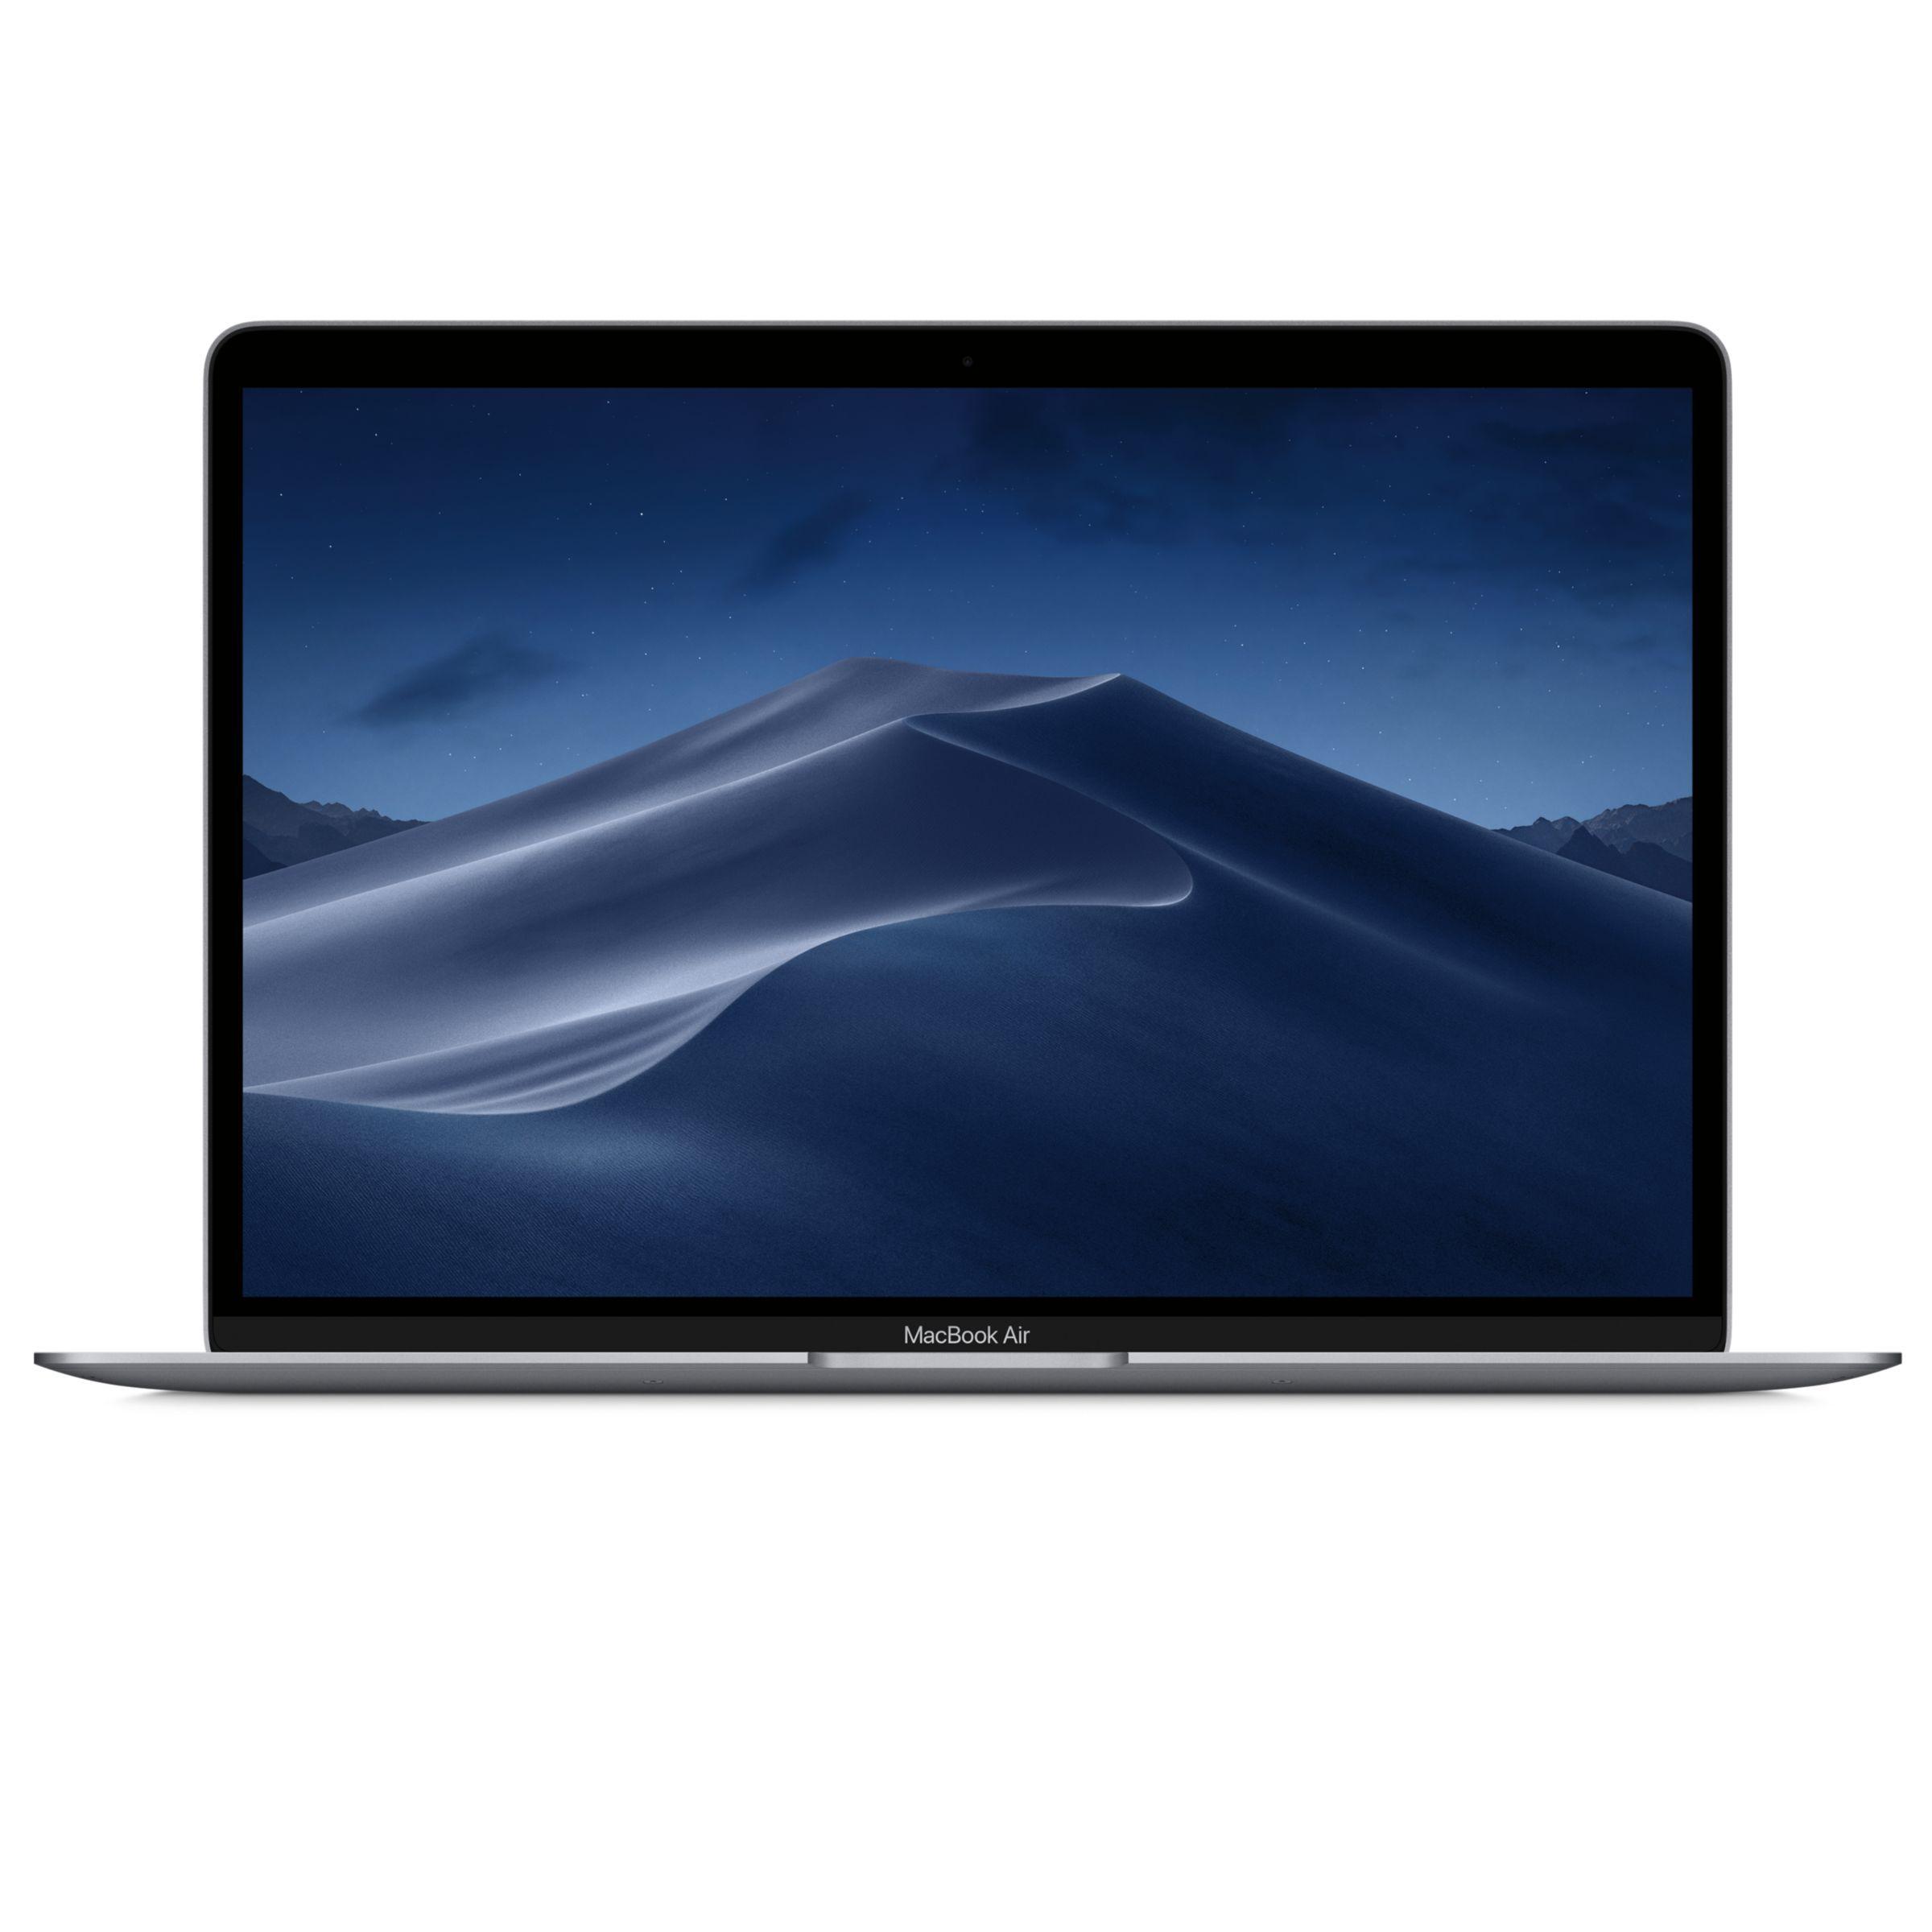 "2019 Apple MacBook Air 13.3"" Retina Display, Intel Core i5"